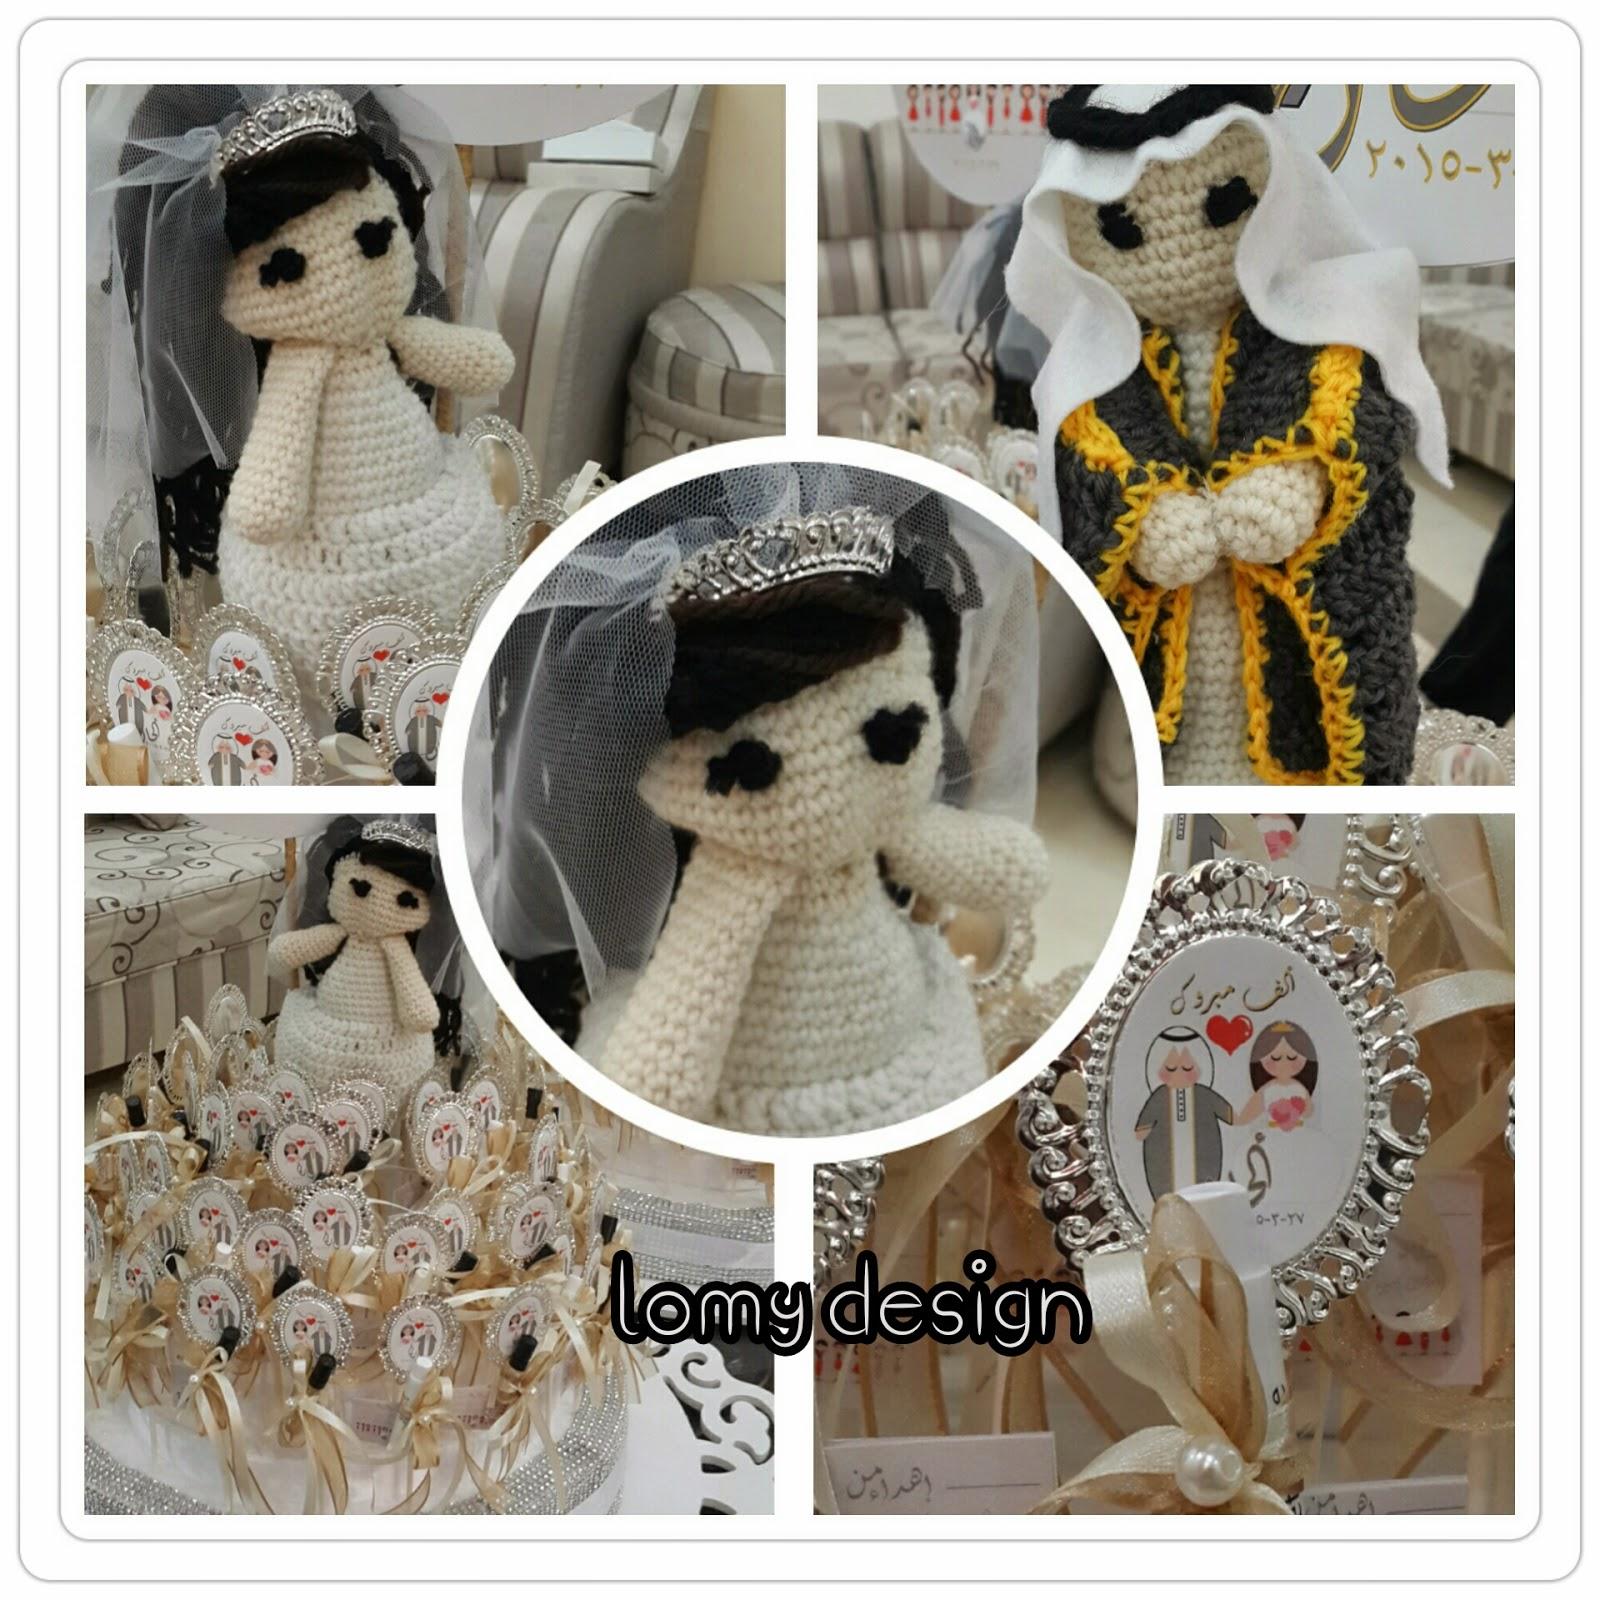 Lomy Design New Wedding Favors